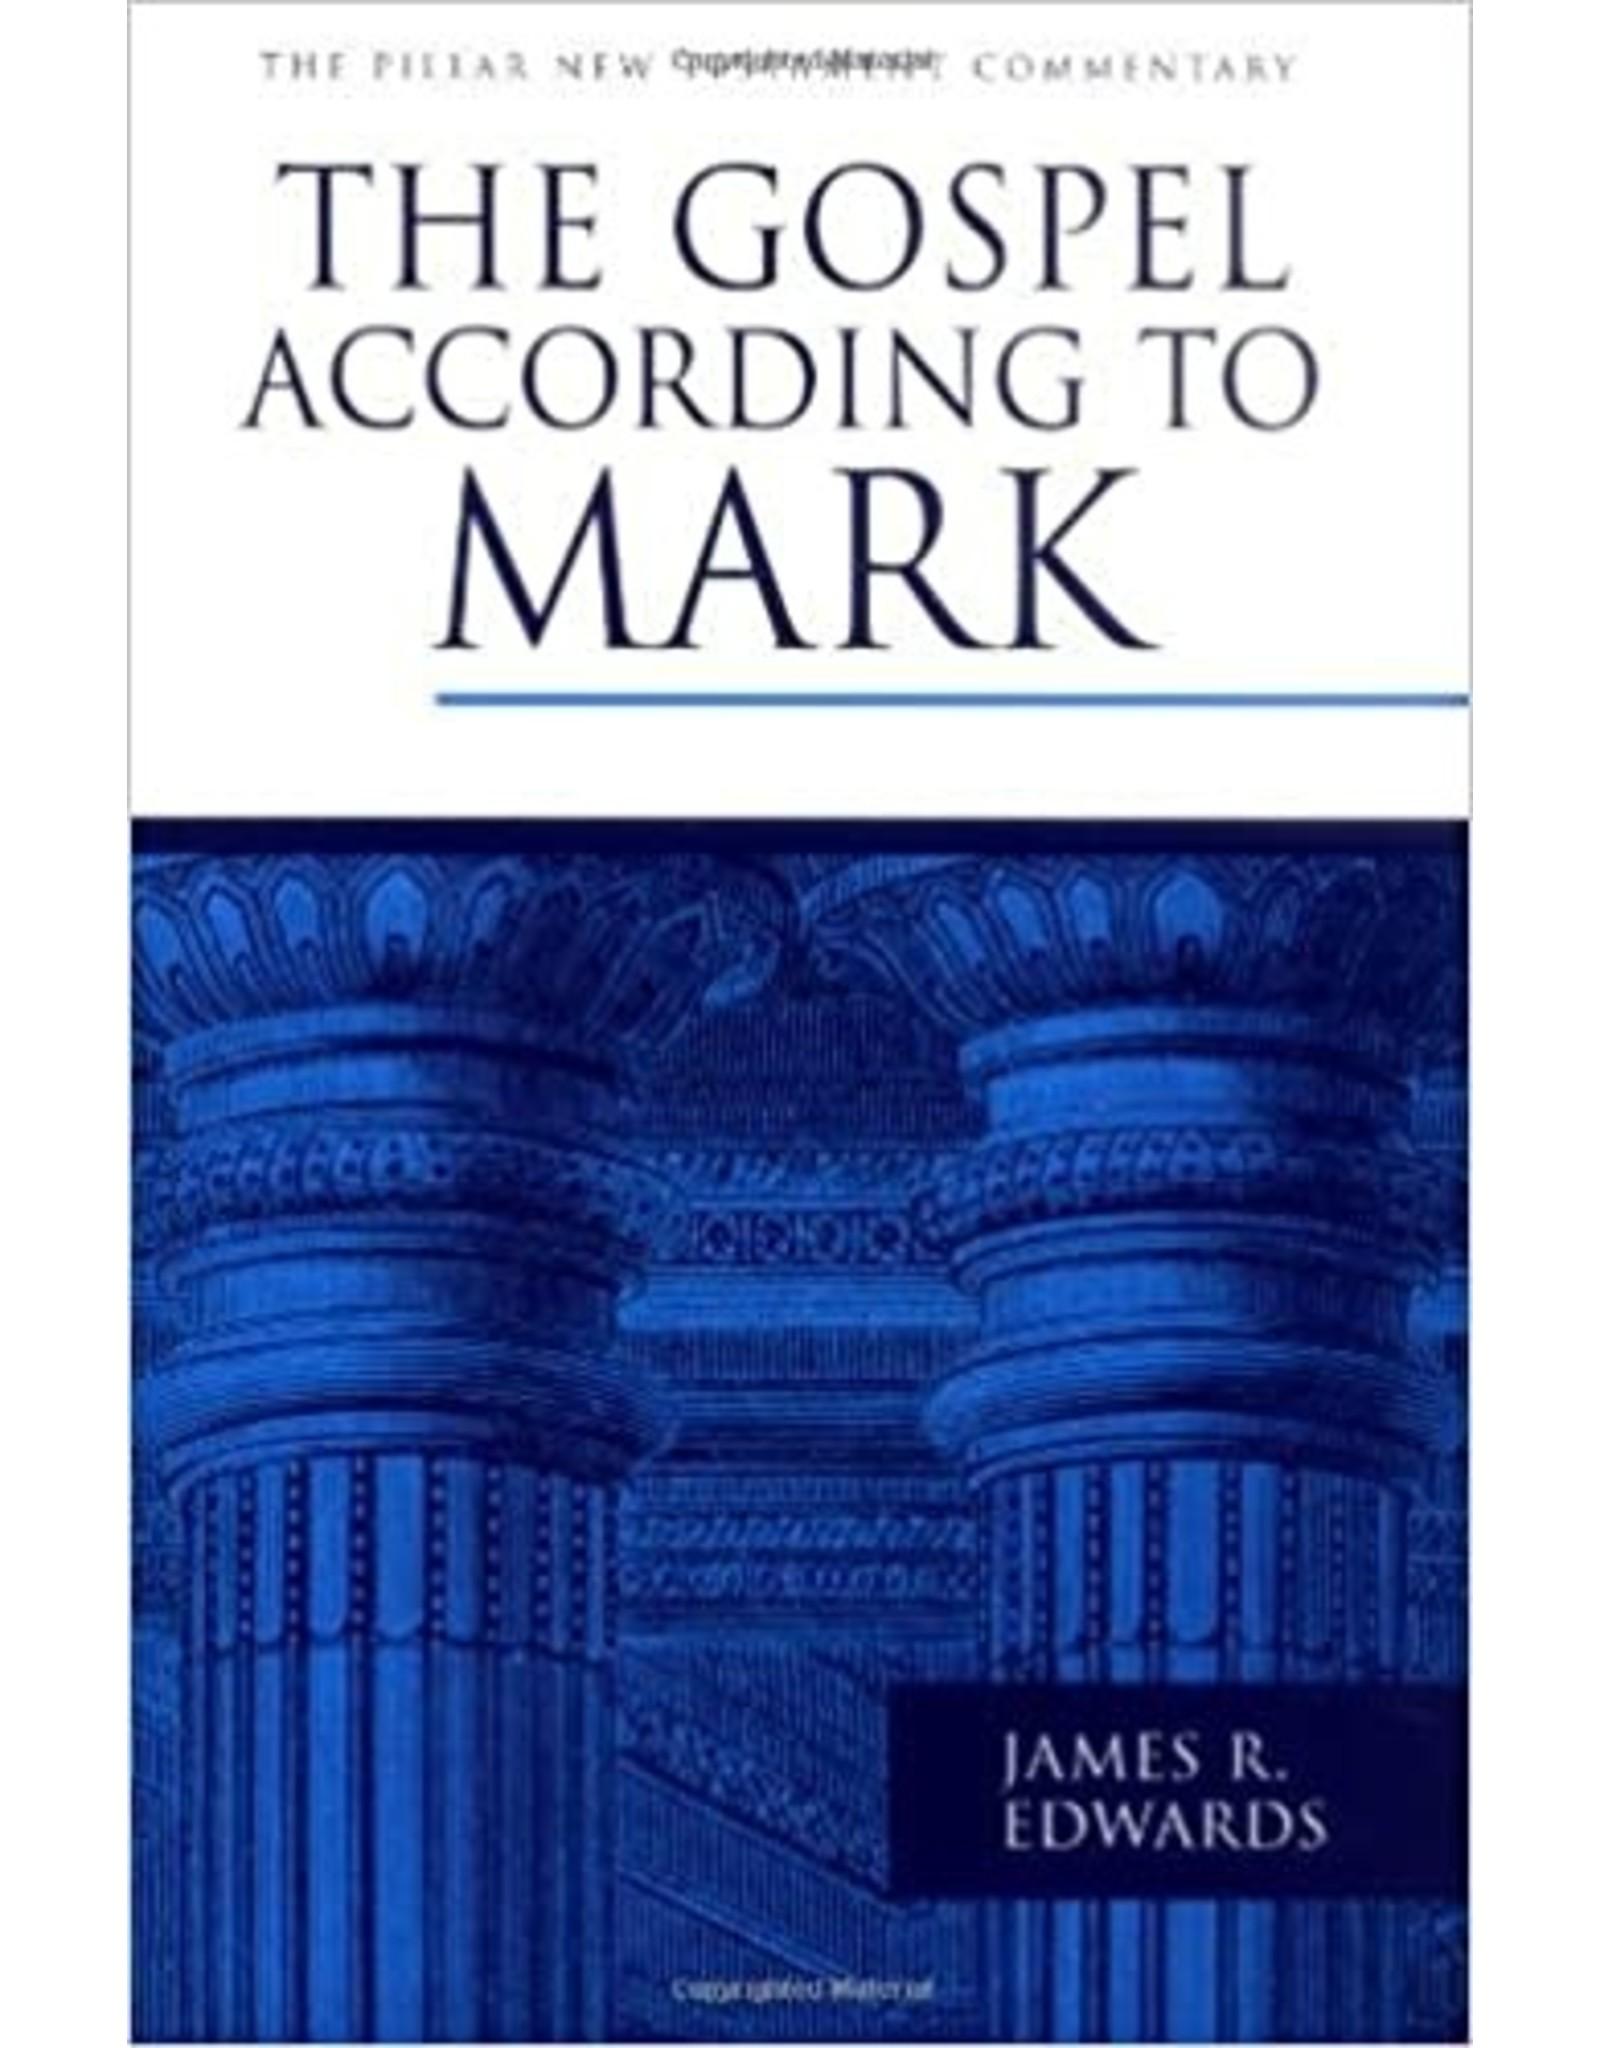 Edwards Pillar Commentary - The Gospel According to Mark